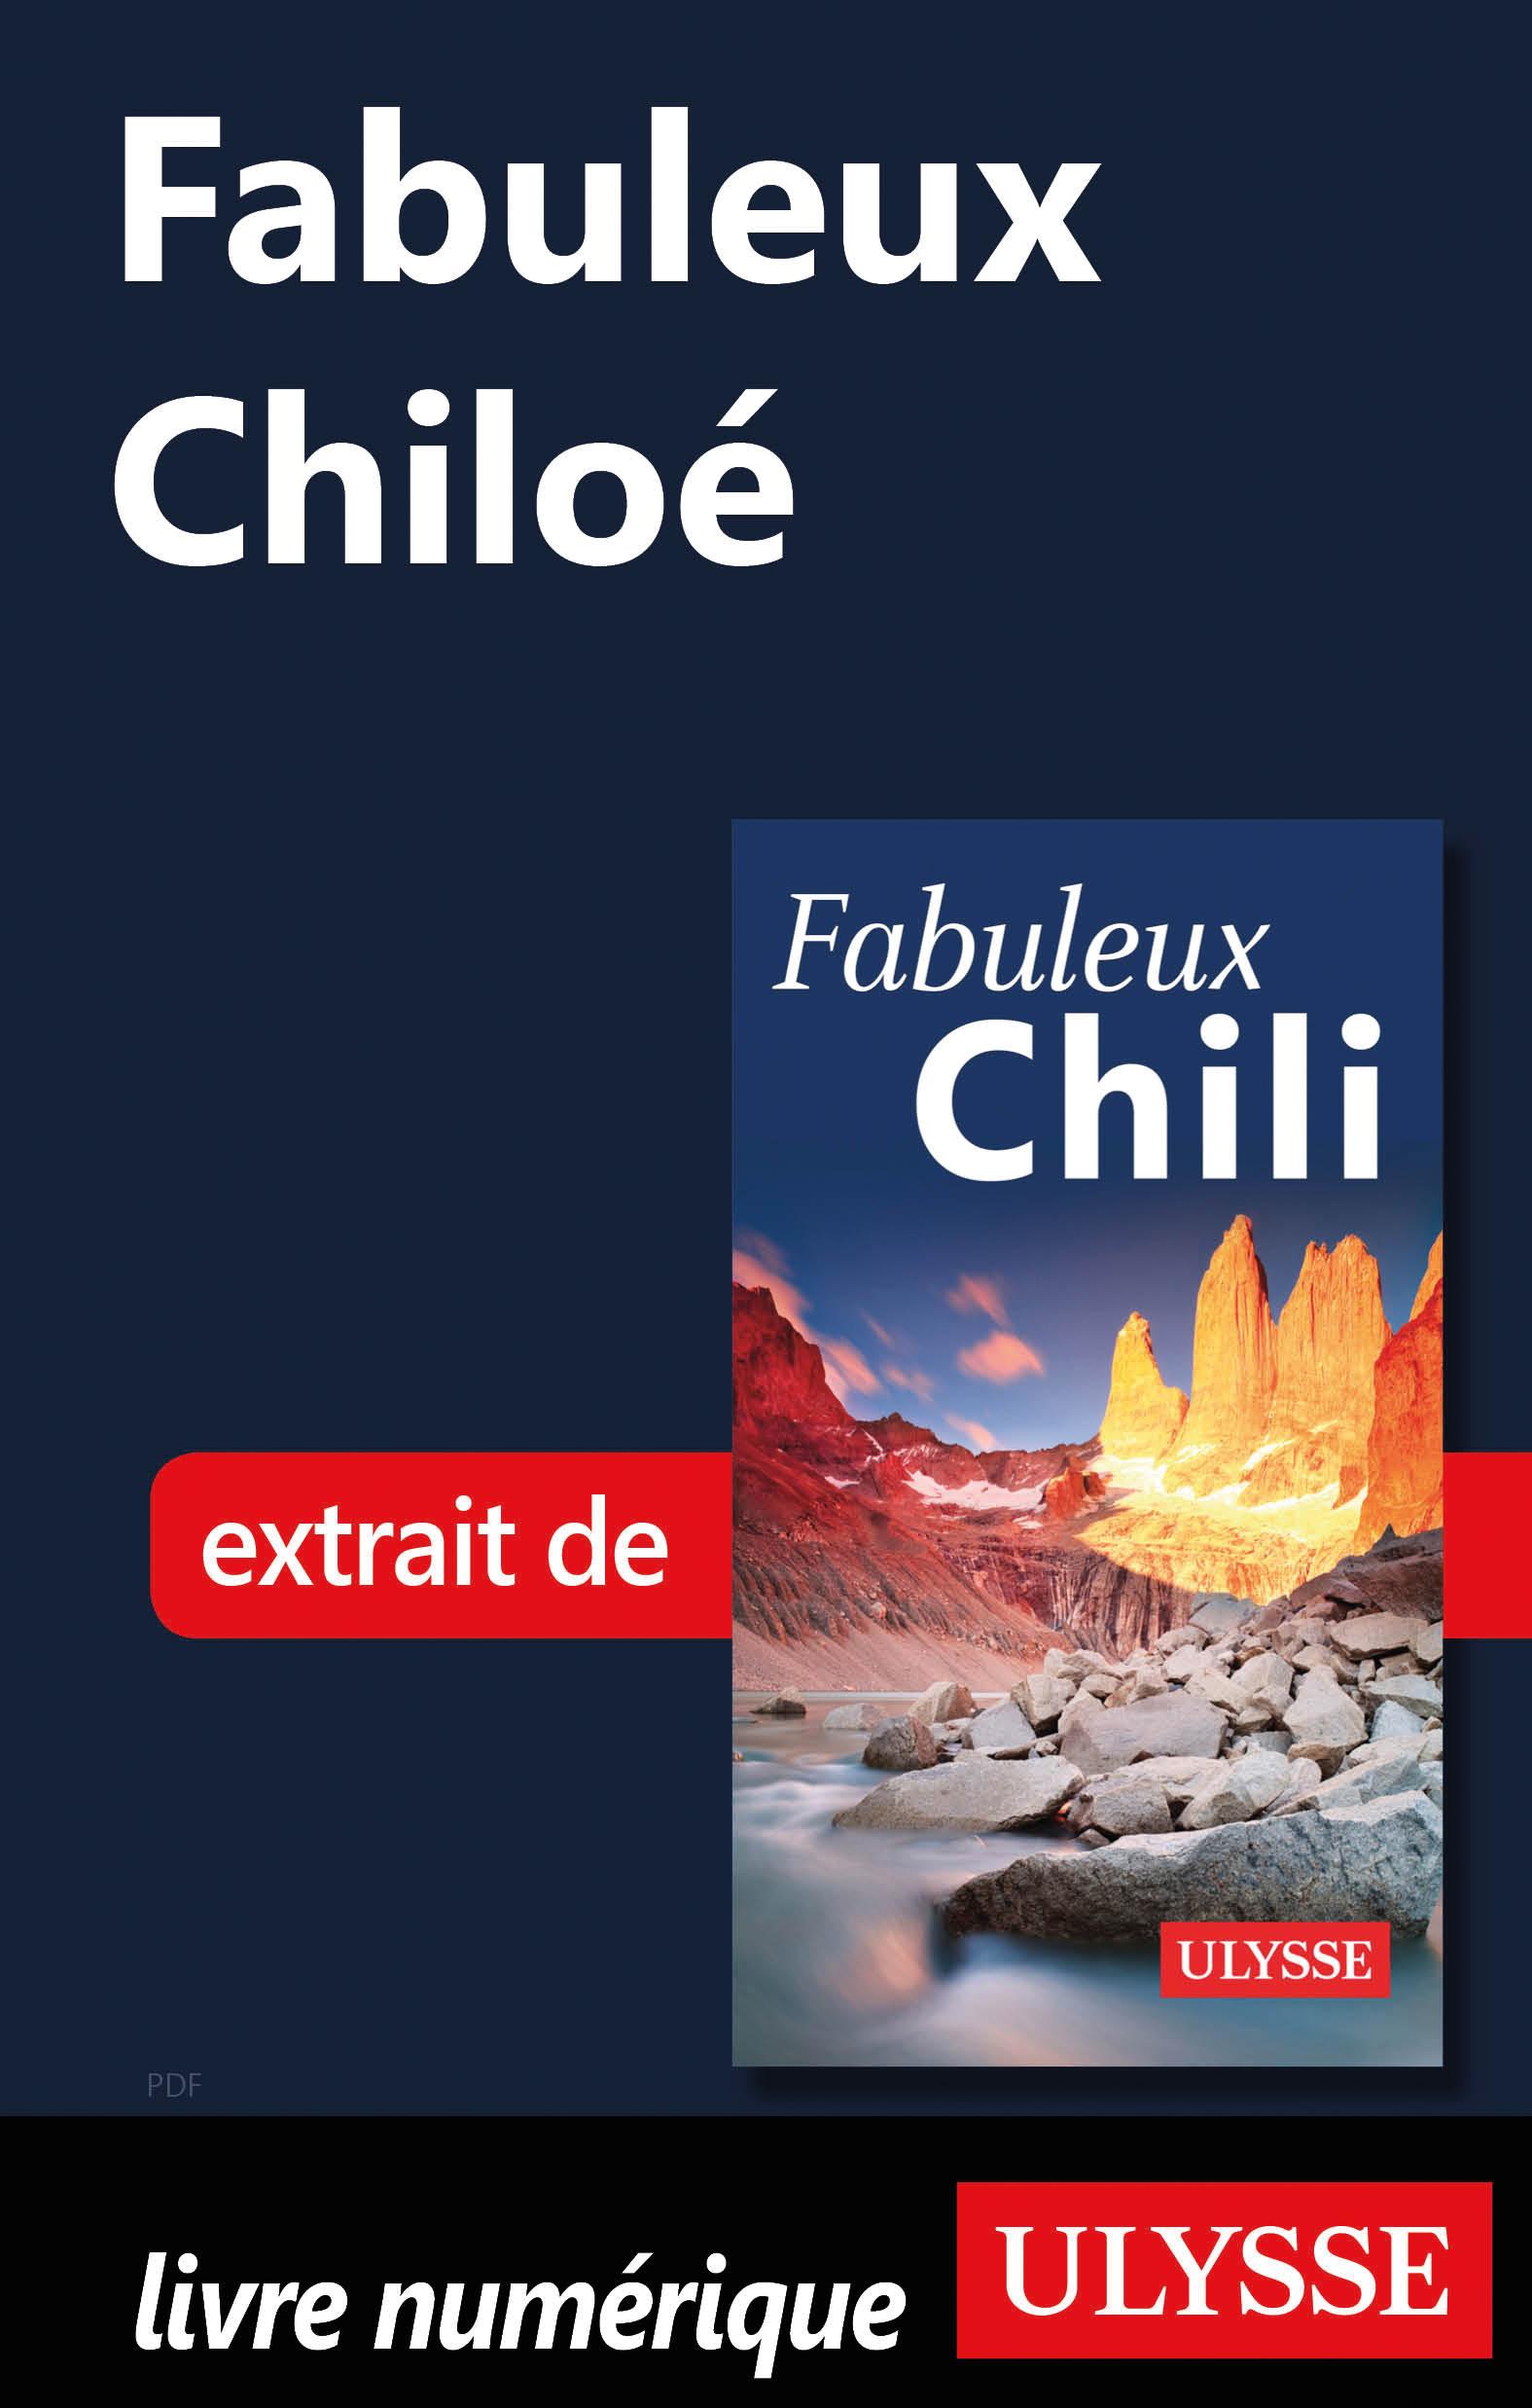 Fabuleux Chiloé (Chili)